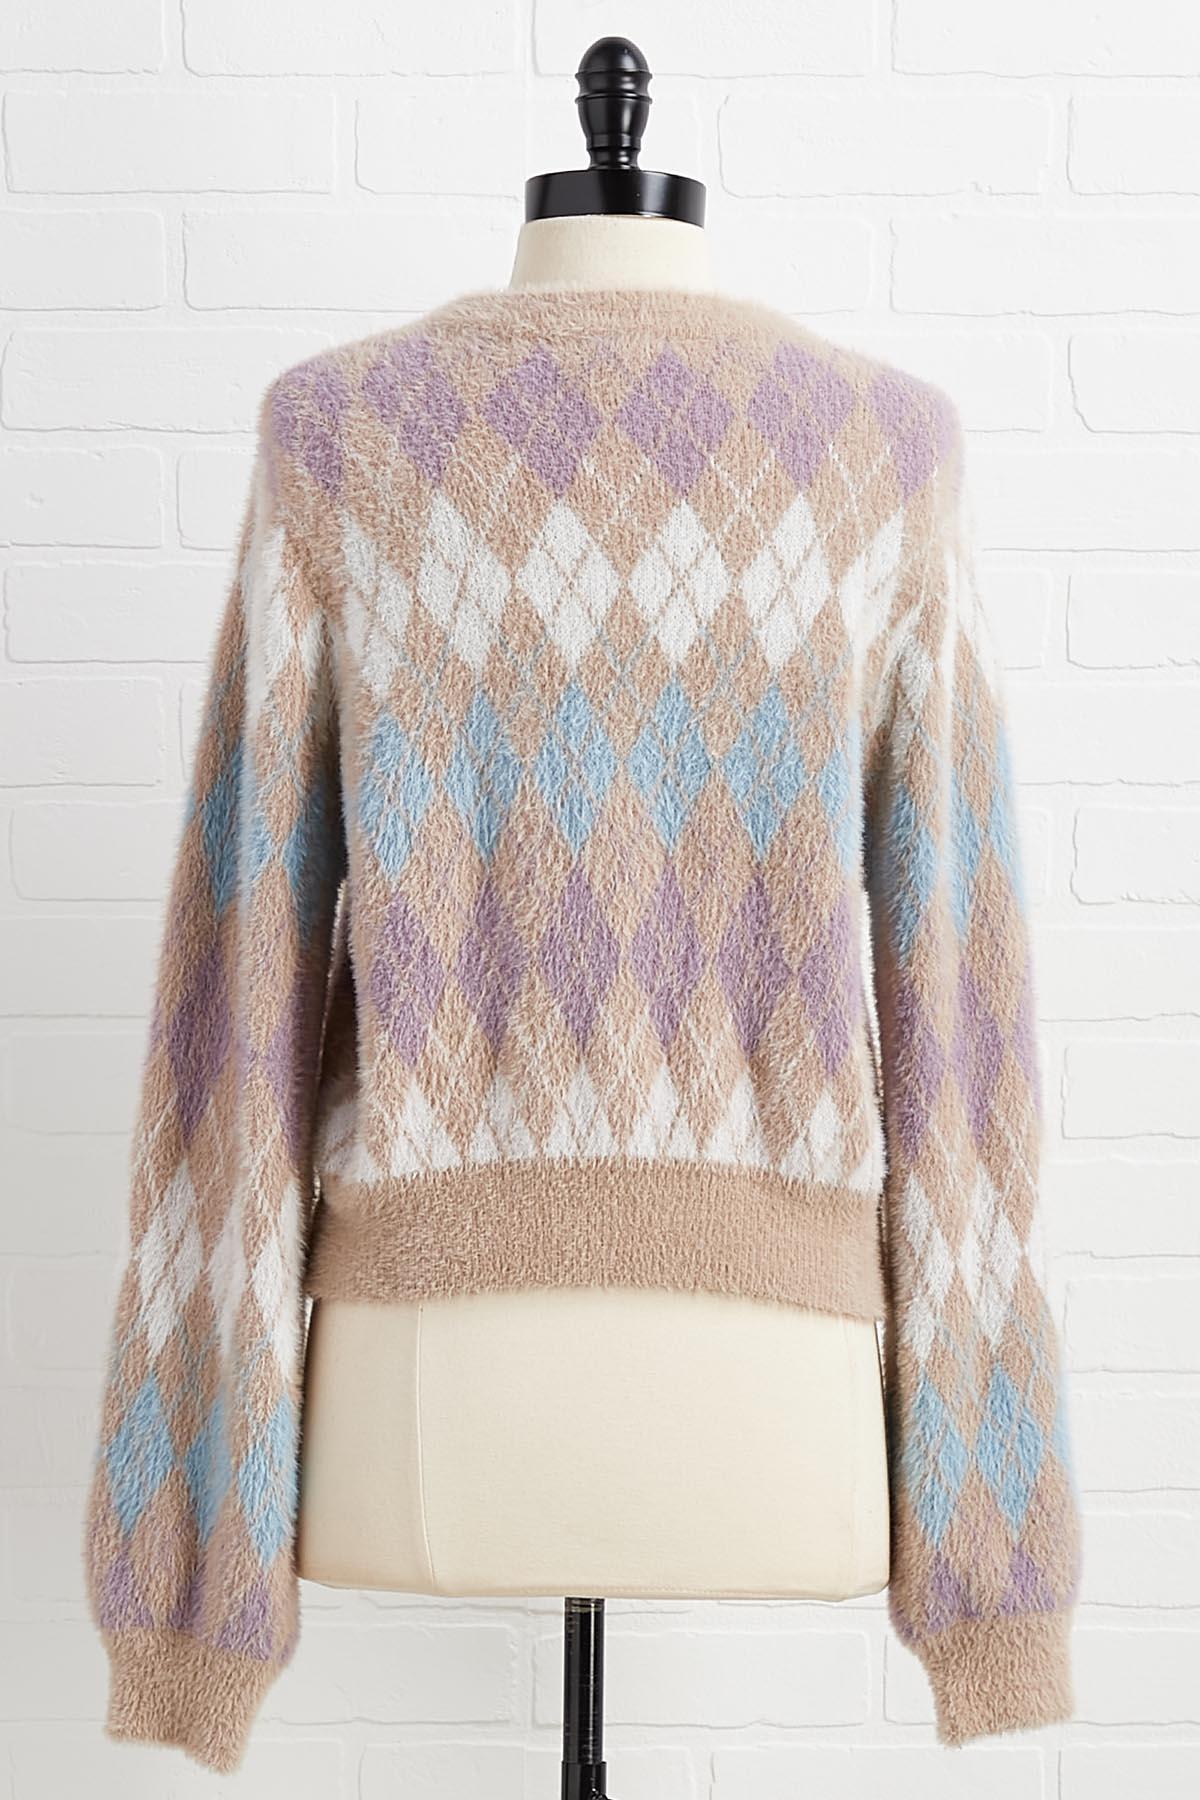 Cuddling Cozy Sweater